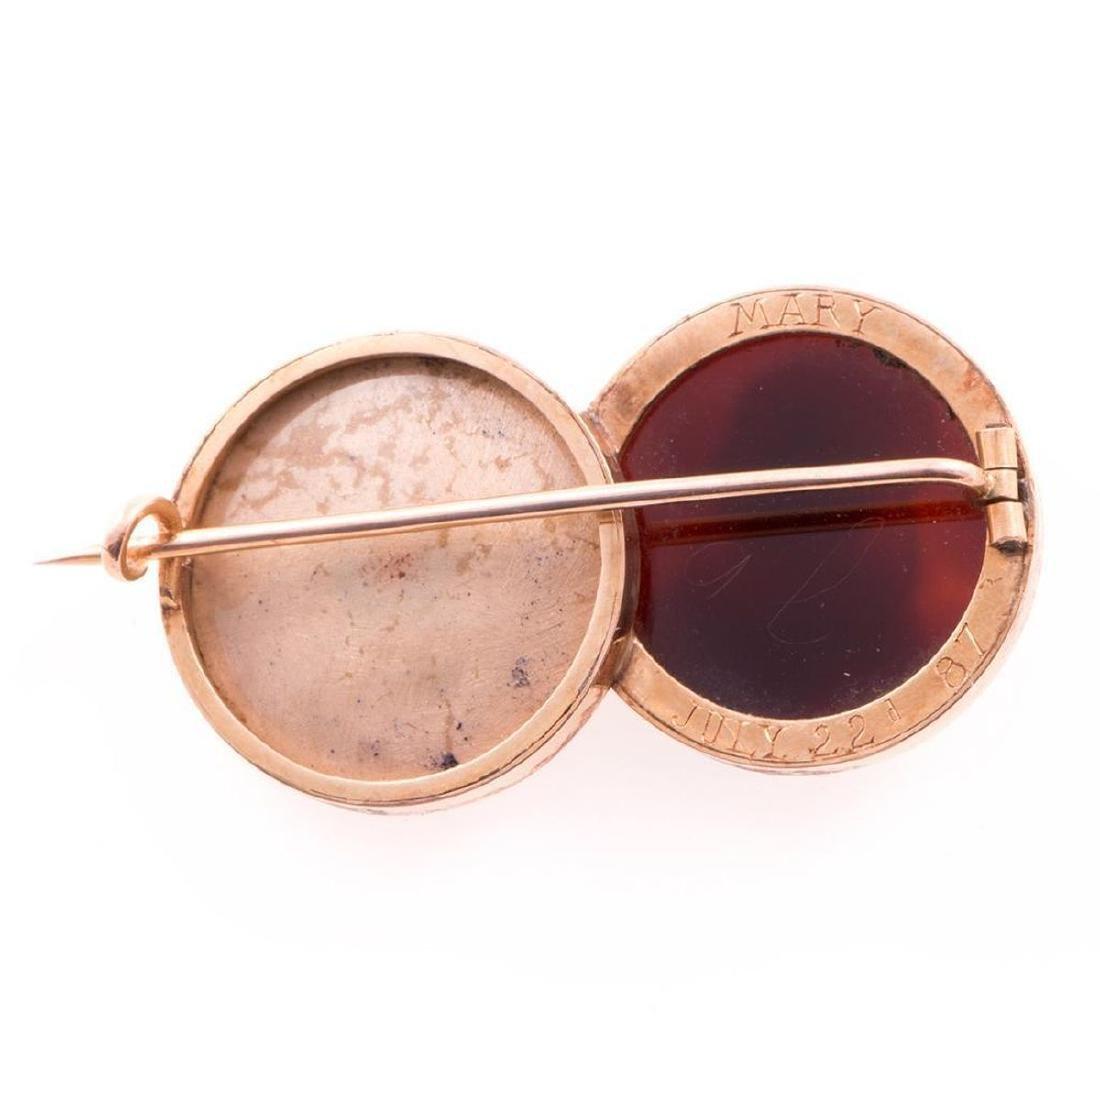 Antique enamel, hardstone cameo and 14k gold brooch - 3